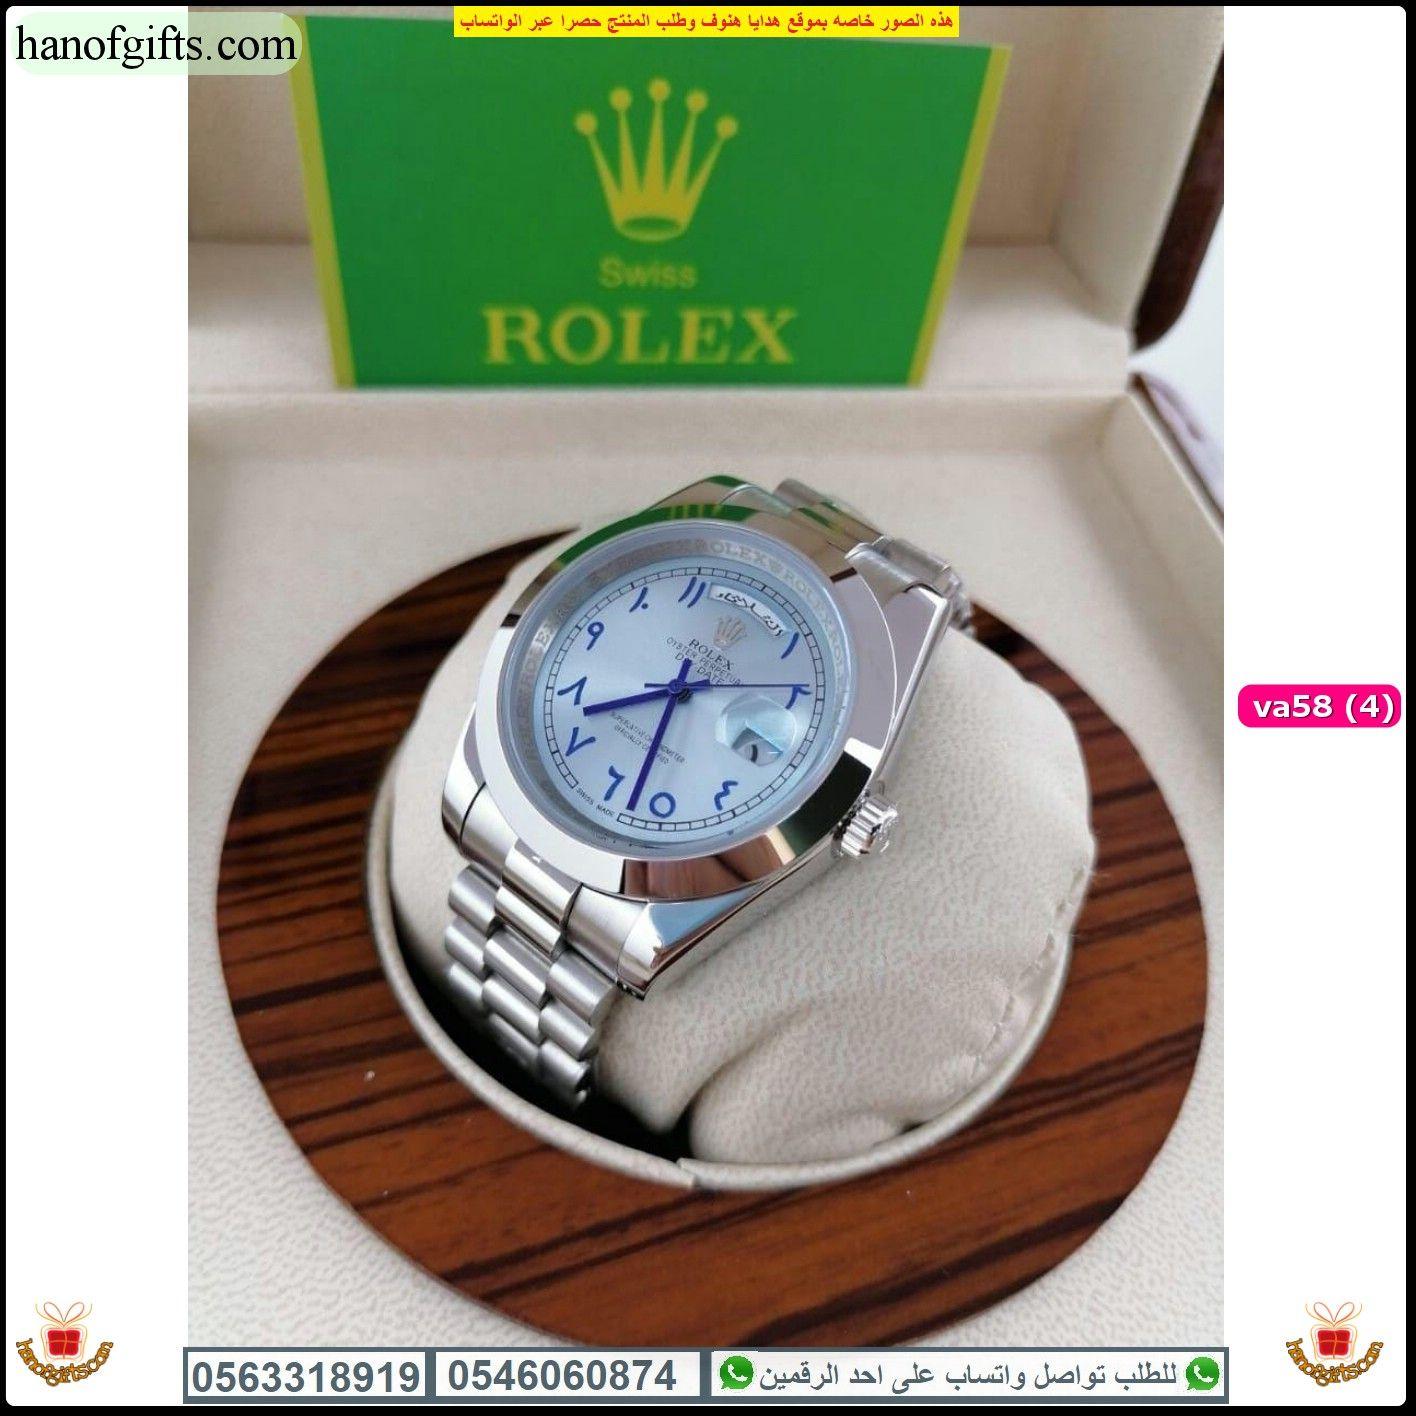 ساعات رولكس رجالي Rolex عربي درجه اولى مع علبه فخمه و كرت ماركه هدايا هنوف Omega Watches Omega Watch